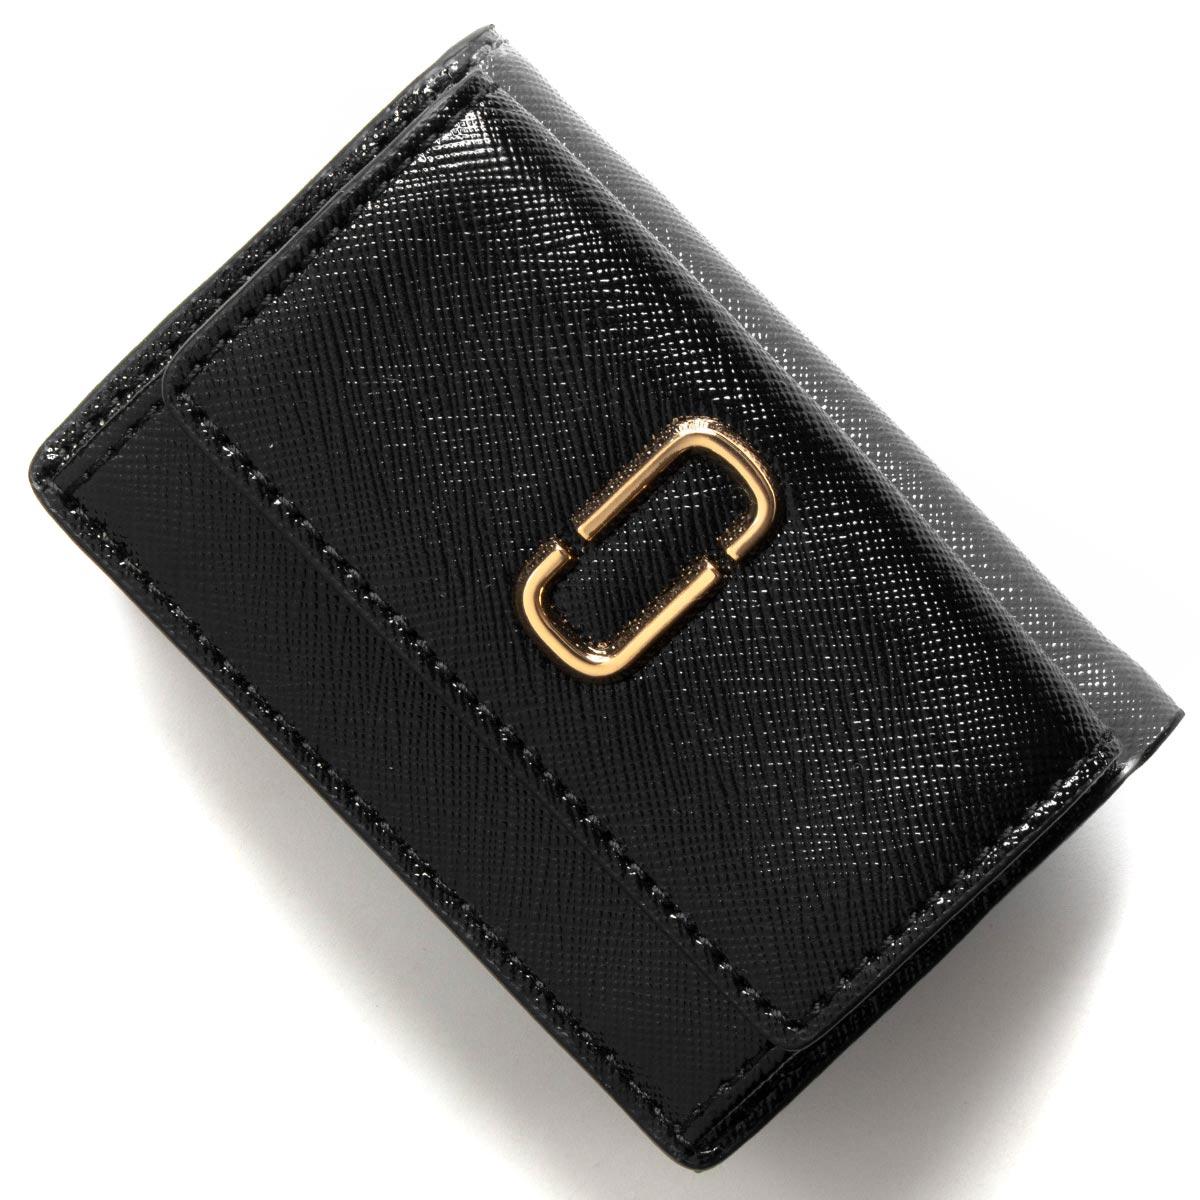 6a3392cea158 マークジェイコブス 三つ折り財布/ミニ財布 財布 レディース スナップショット ダブルJロゴ ブラック